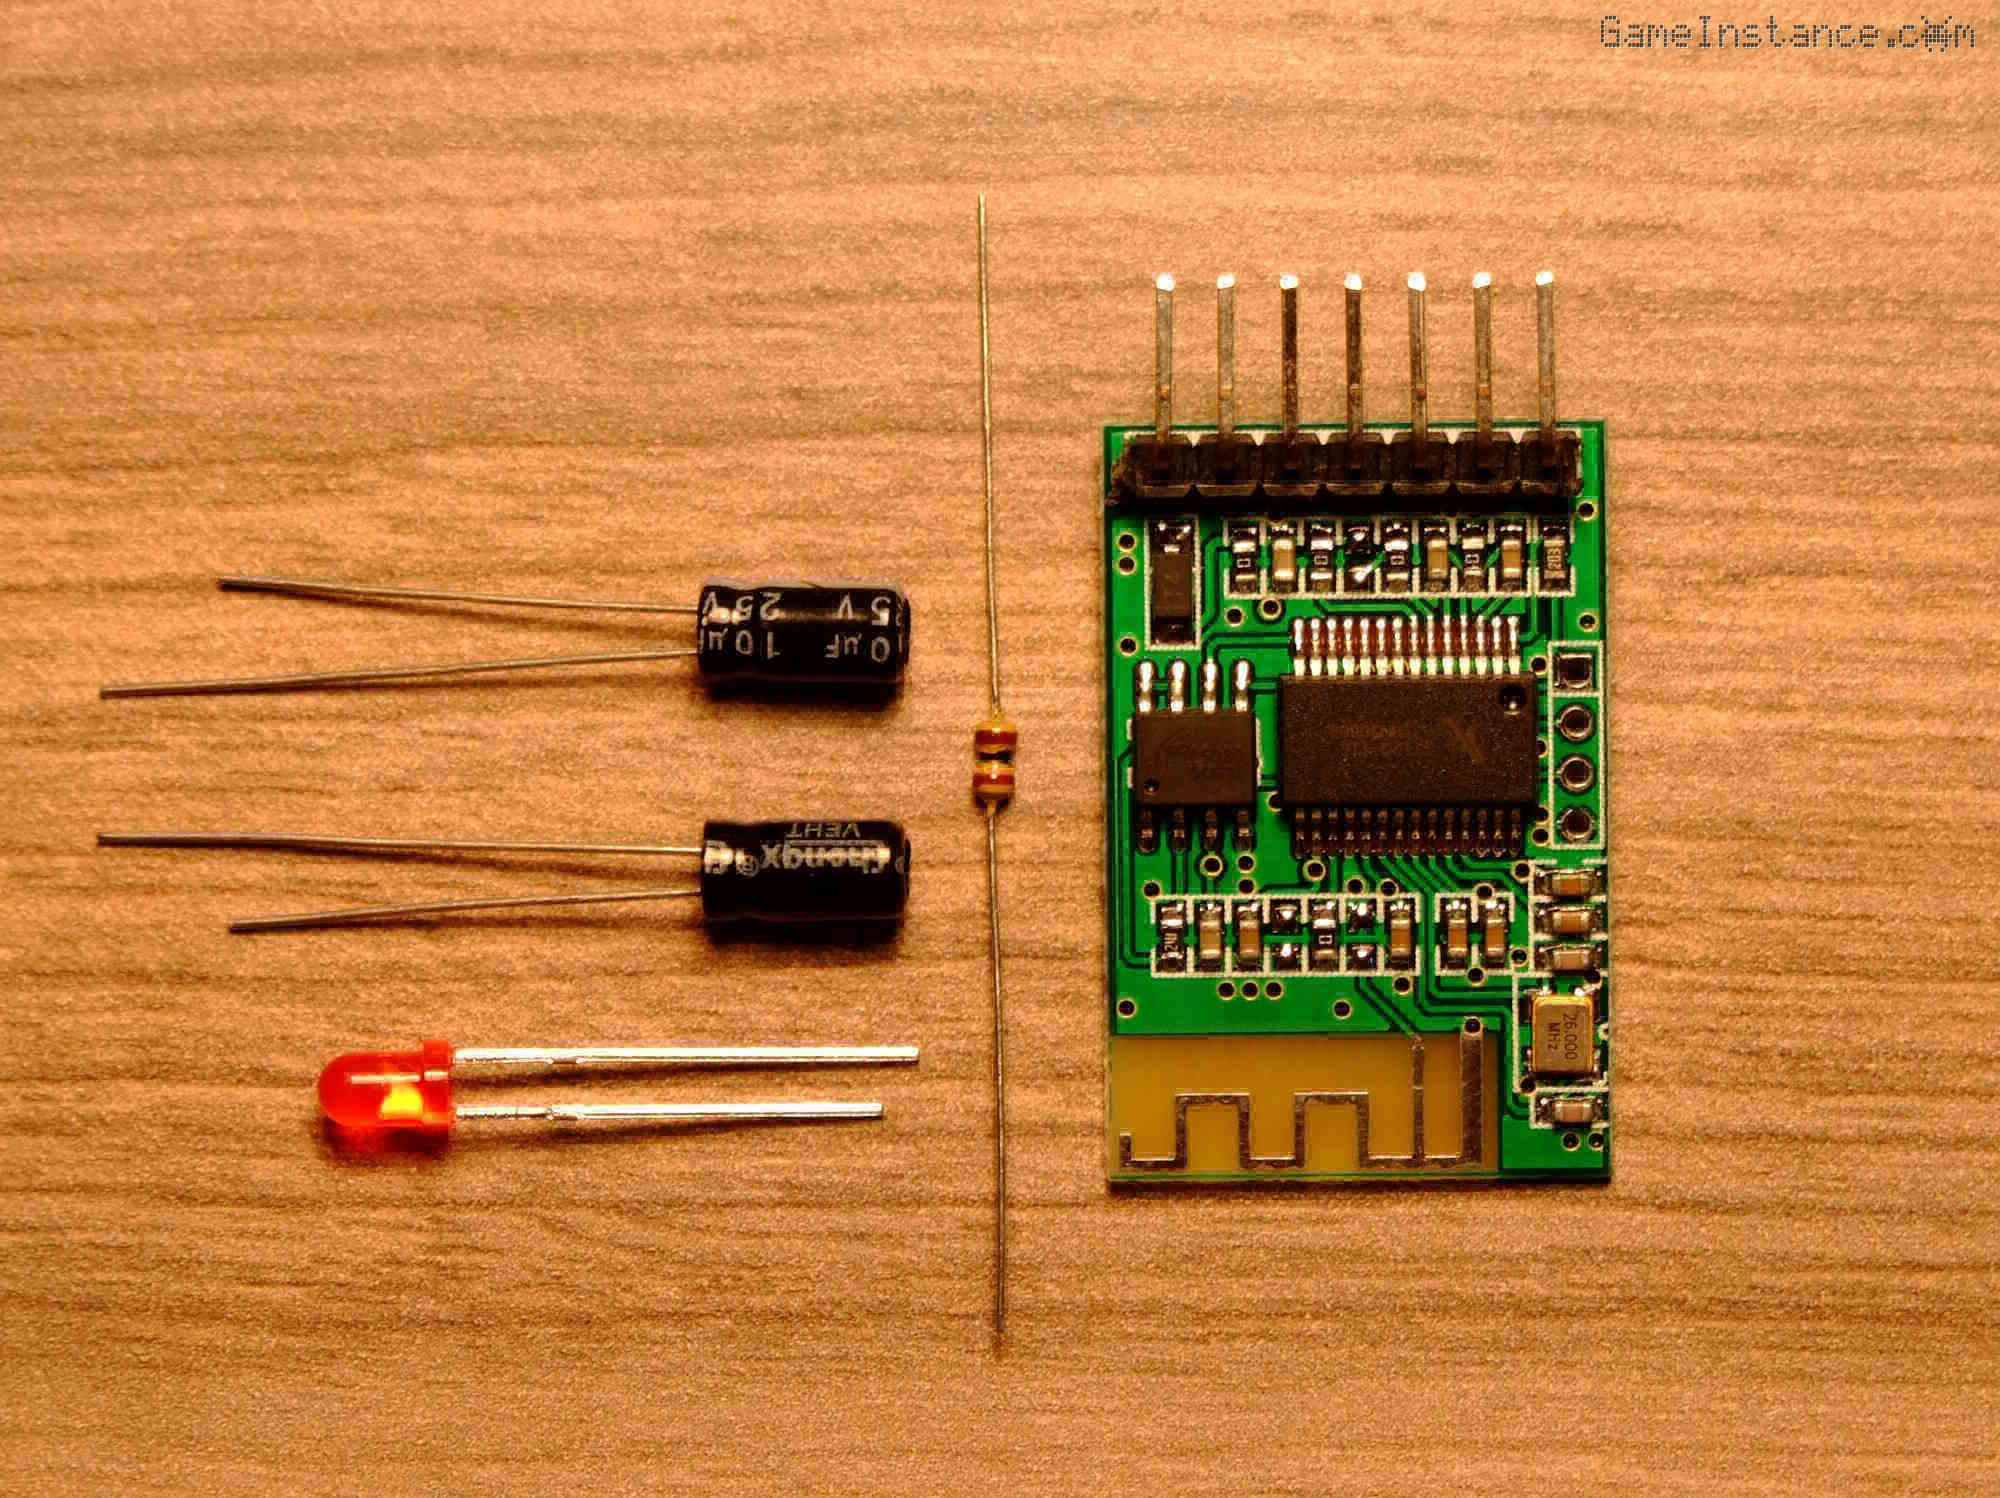 bluetooth audio receiver the. Black Bedroom Furniture Sets. Home Design Ideas